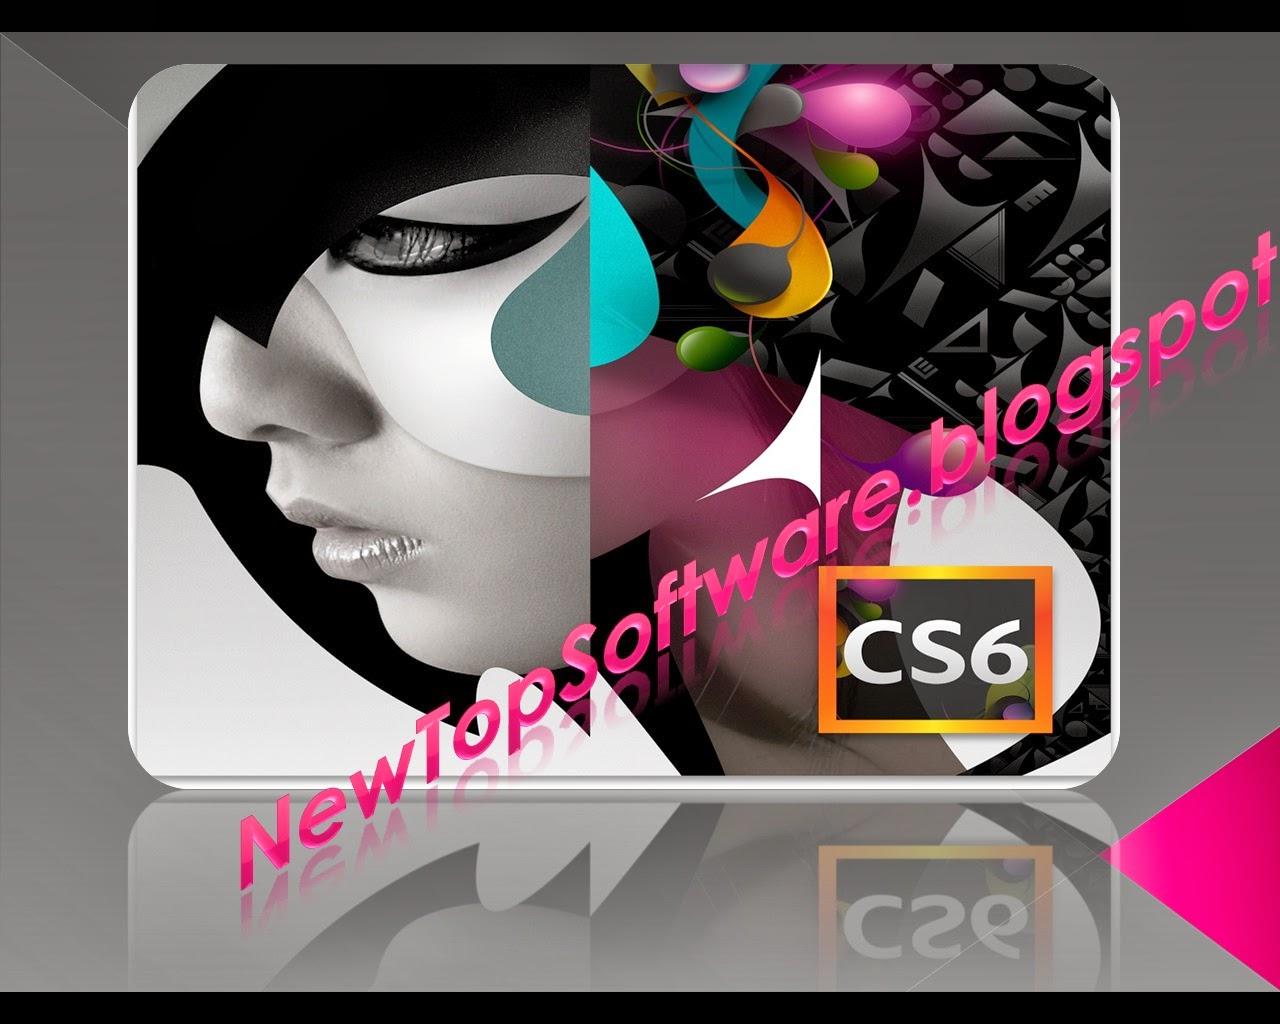 photoshop cs6 download free full version mac